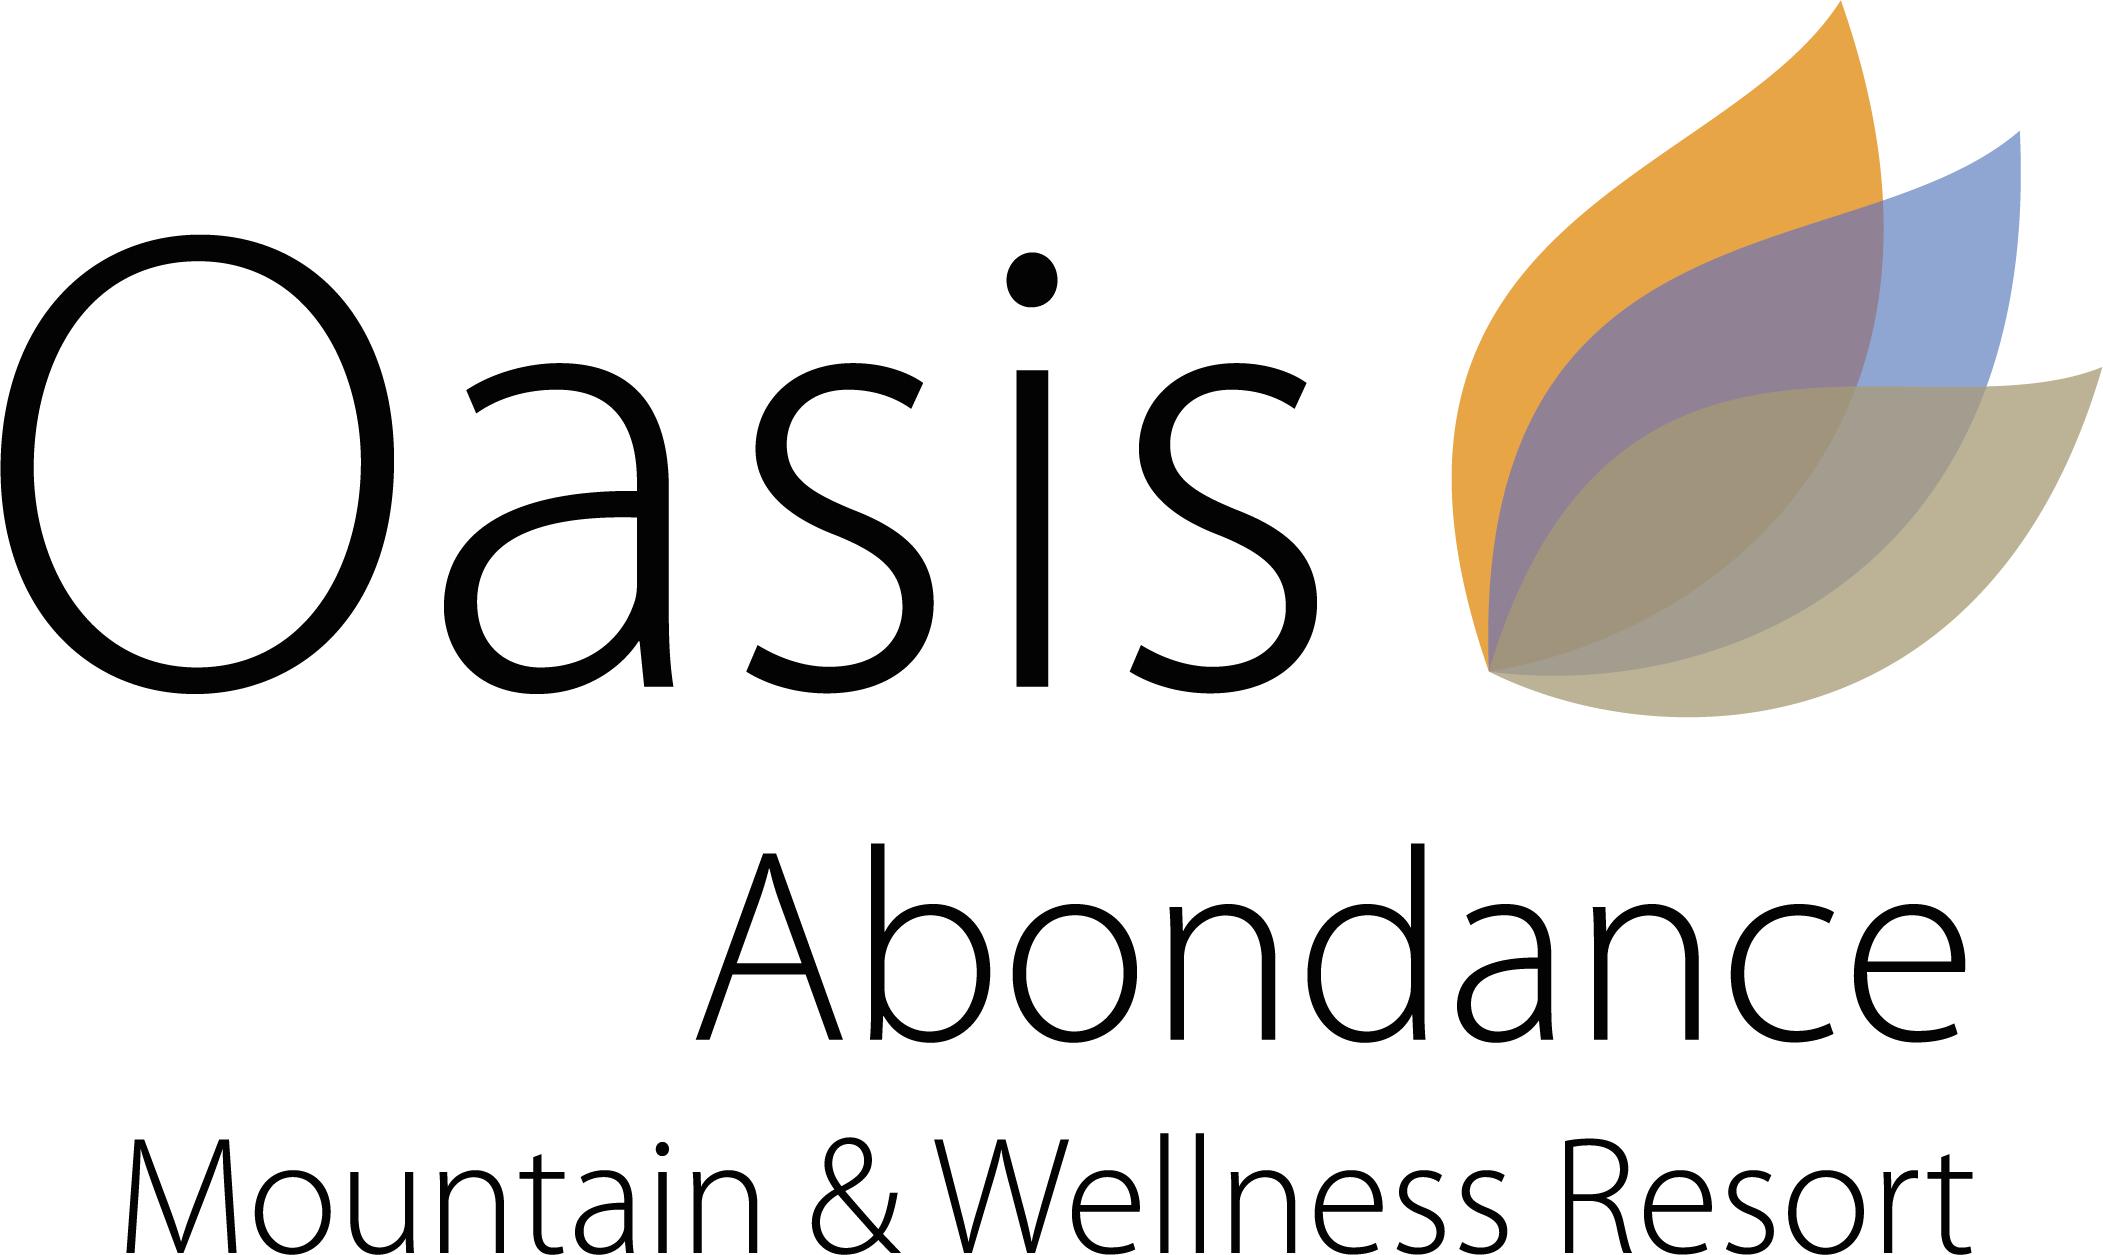 Oasis Abondance | Luxe wellness resort in Portes du Soleil